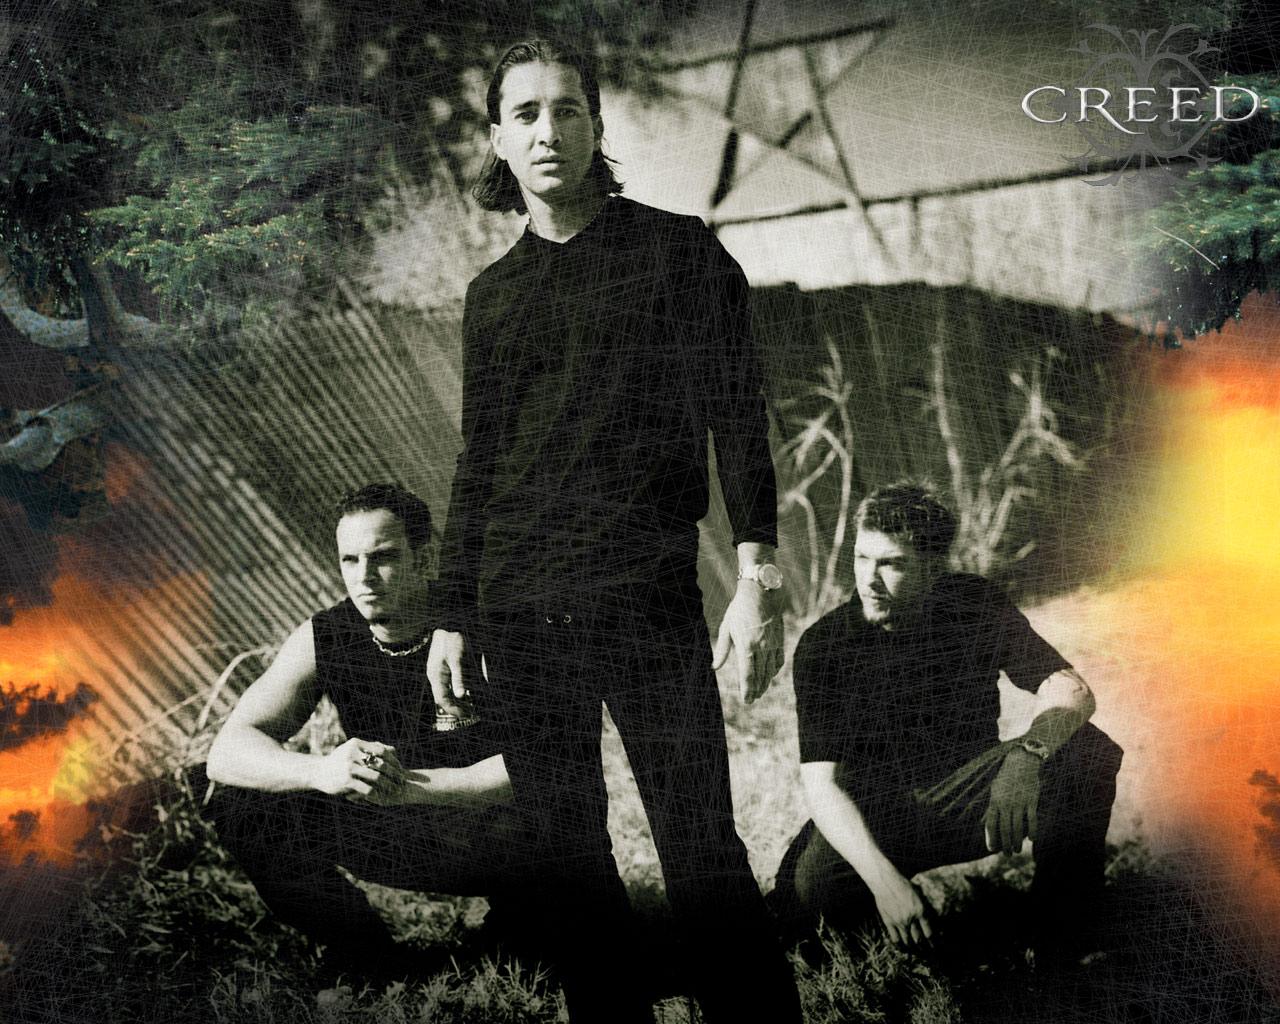 Creed Wallpaper 1280 x 1024 1280x1024